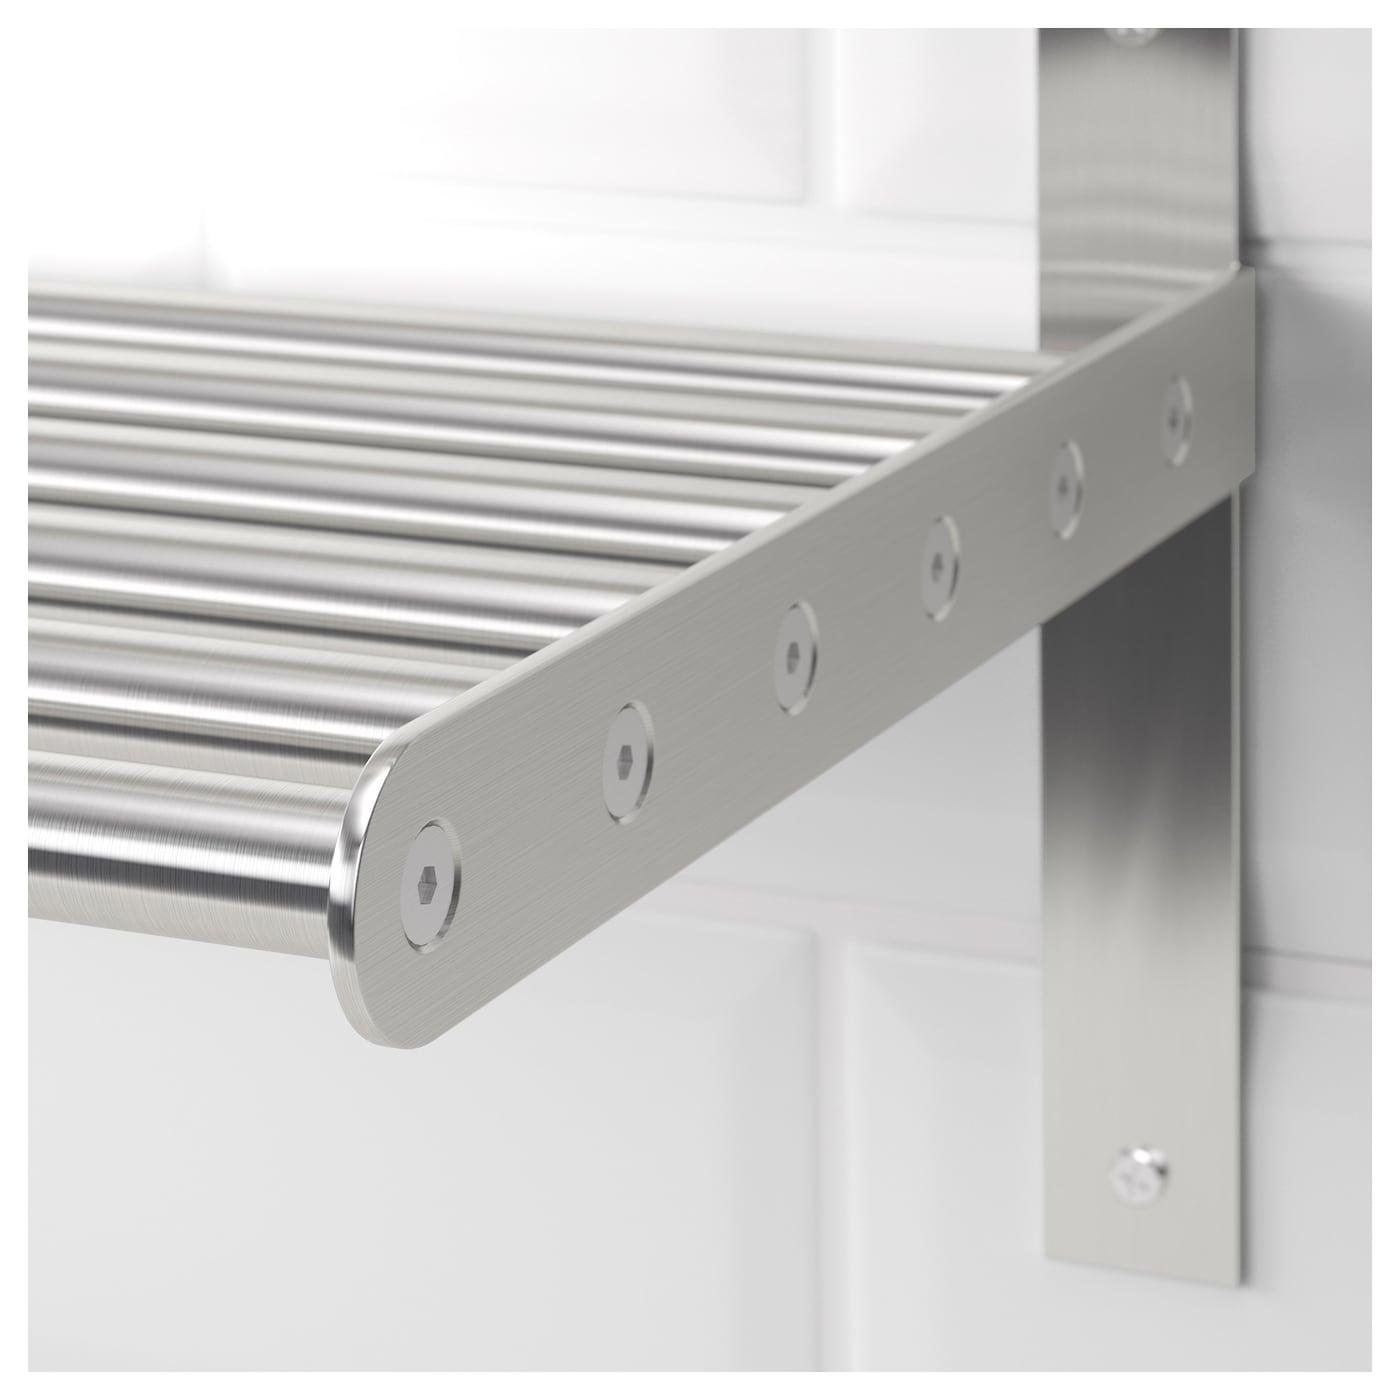 Kitchen Metal Wall Shelf: GRUNDTAL Wall Shelf Stainless Steel 80 Cm